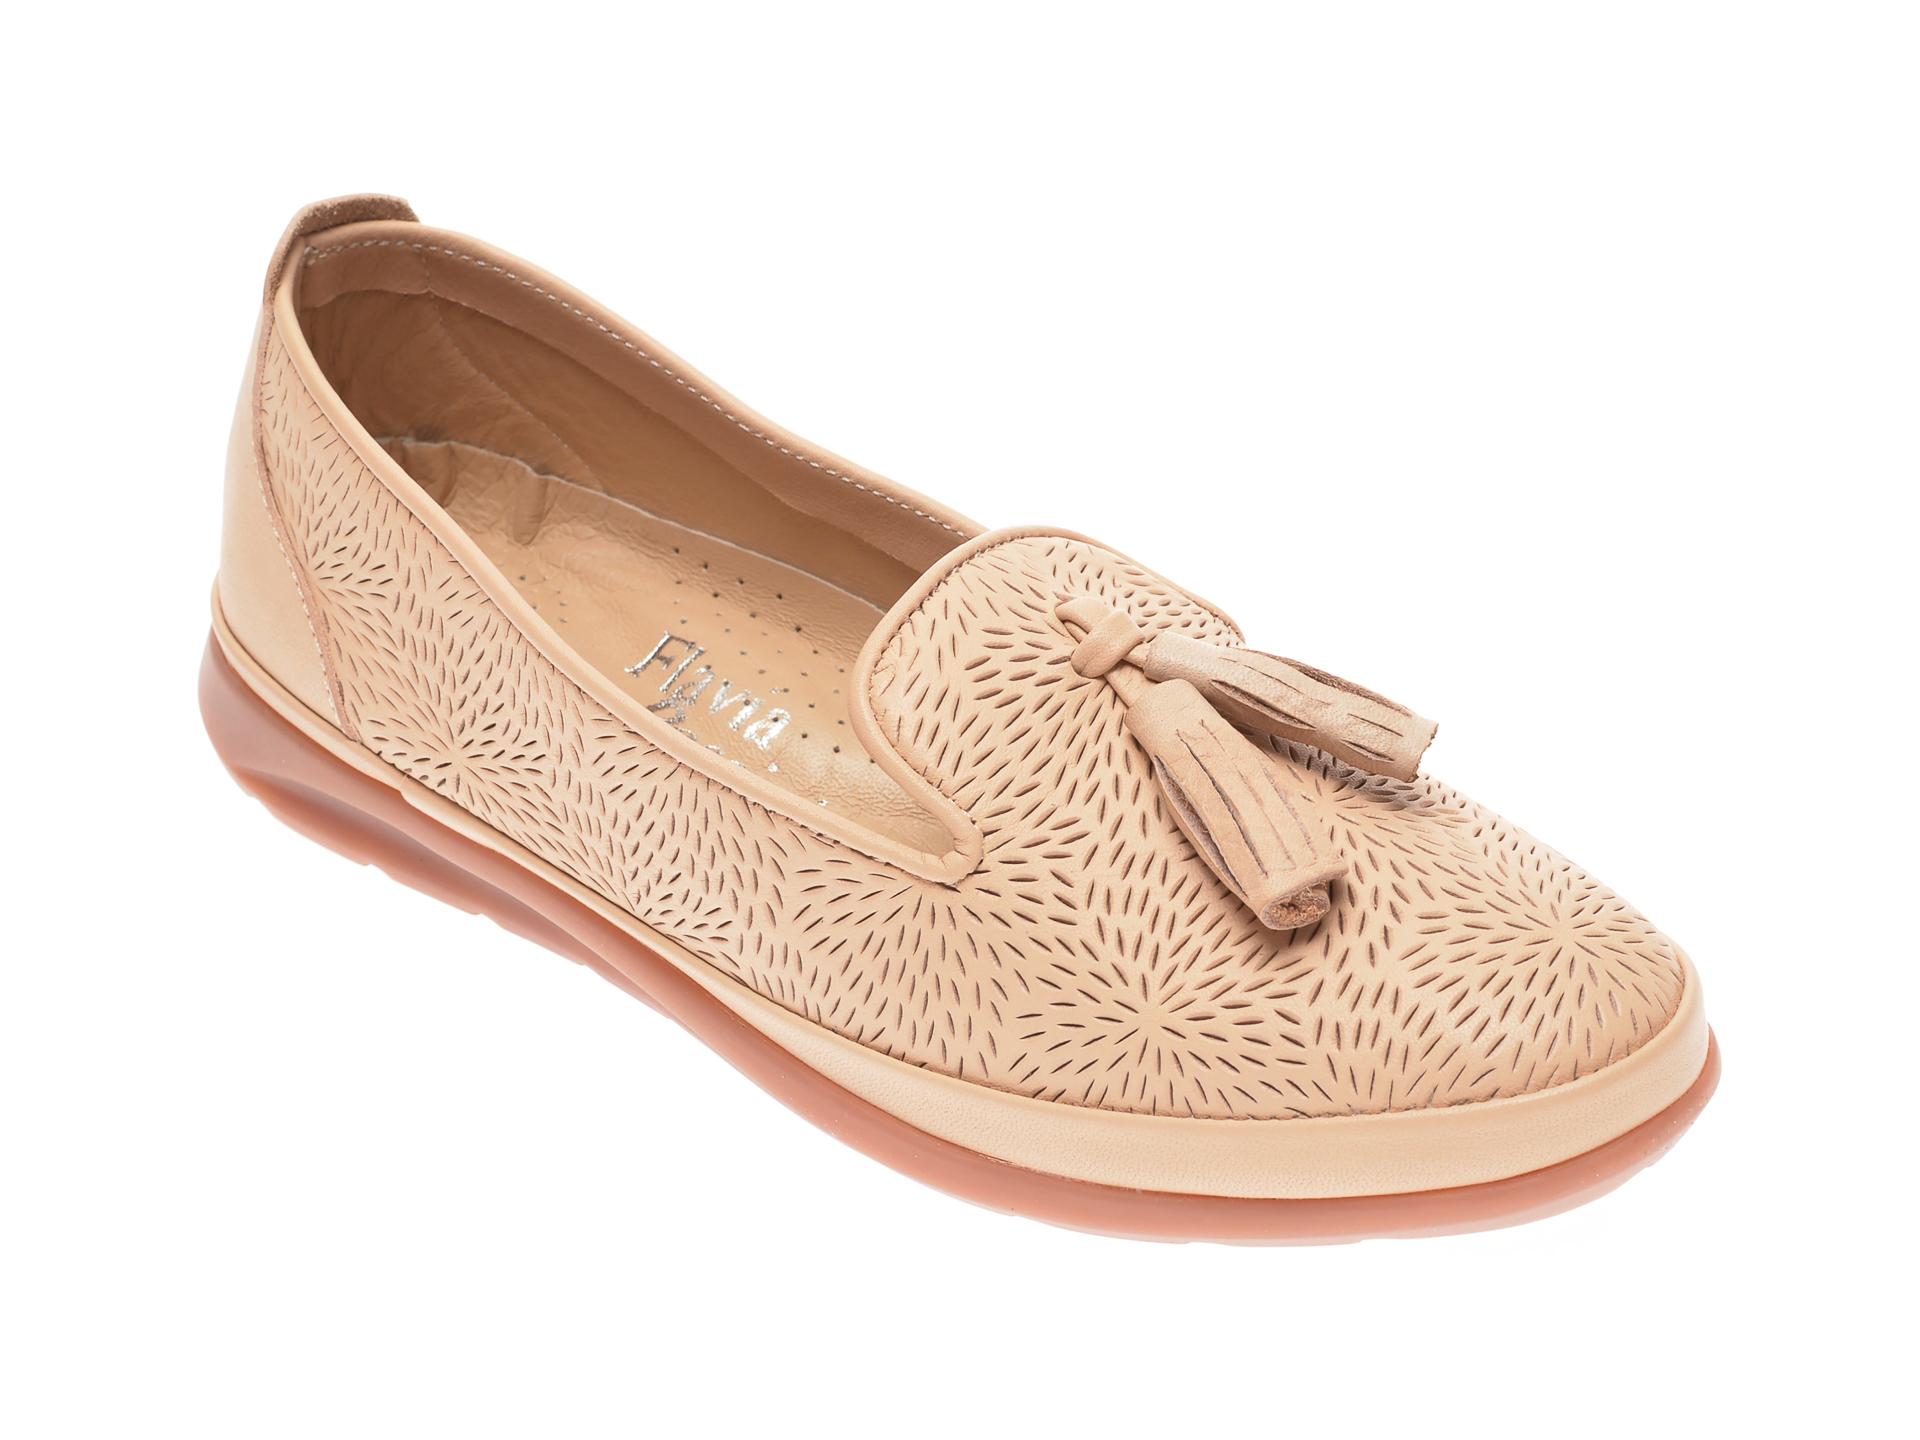 Pantofi FLAVIA PASSINI bej, 14151, din piele naturala imagine